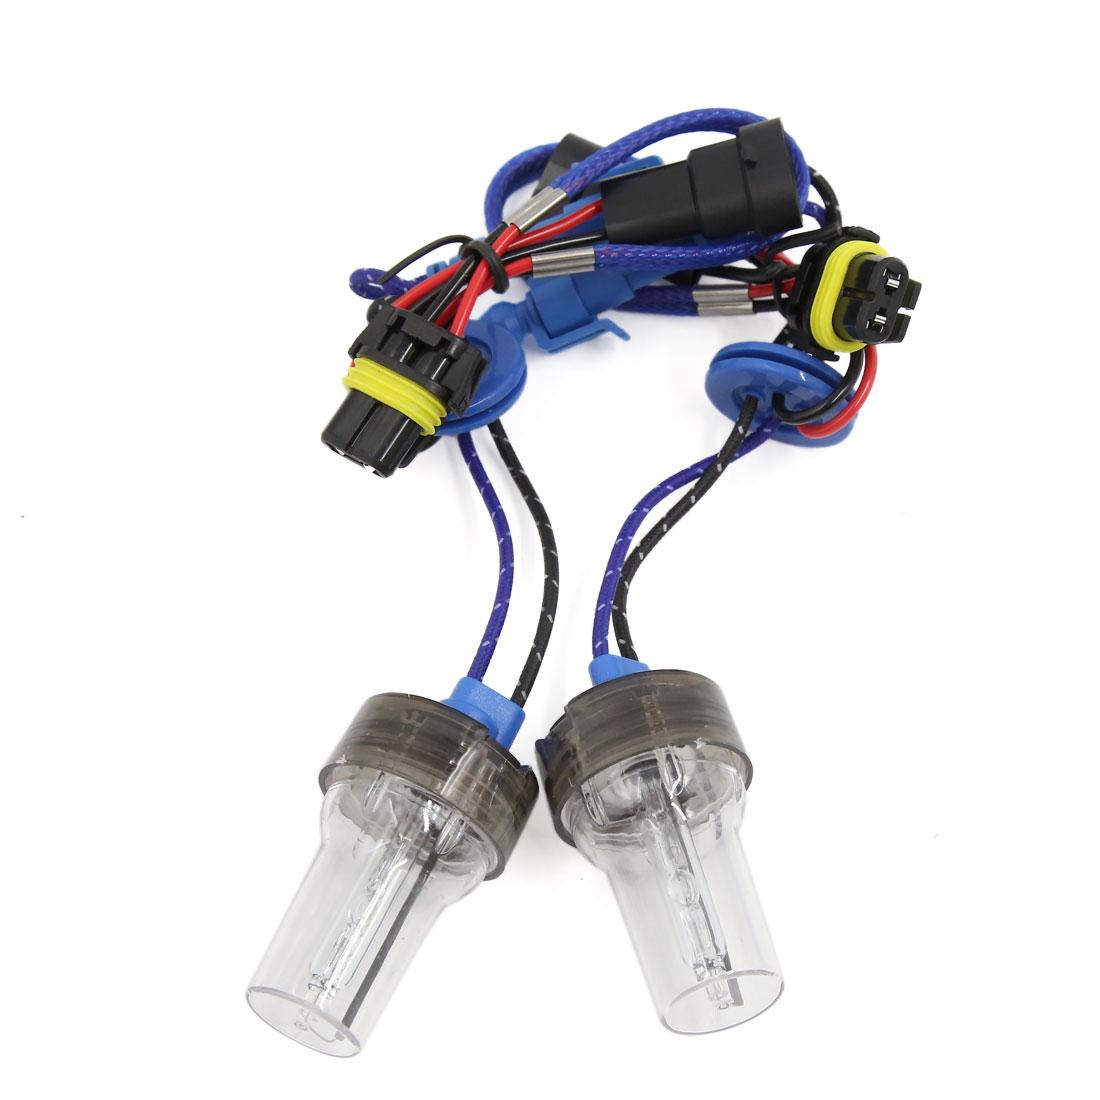 DC 12V 5500K 35W-45W Auto Car 9006 HID Xenon Headlight Light Lamp Bulbs 2PCS